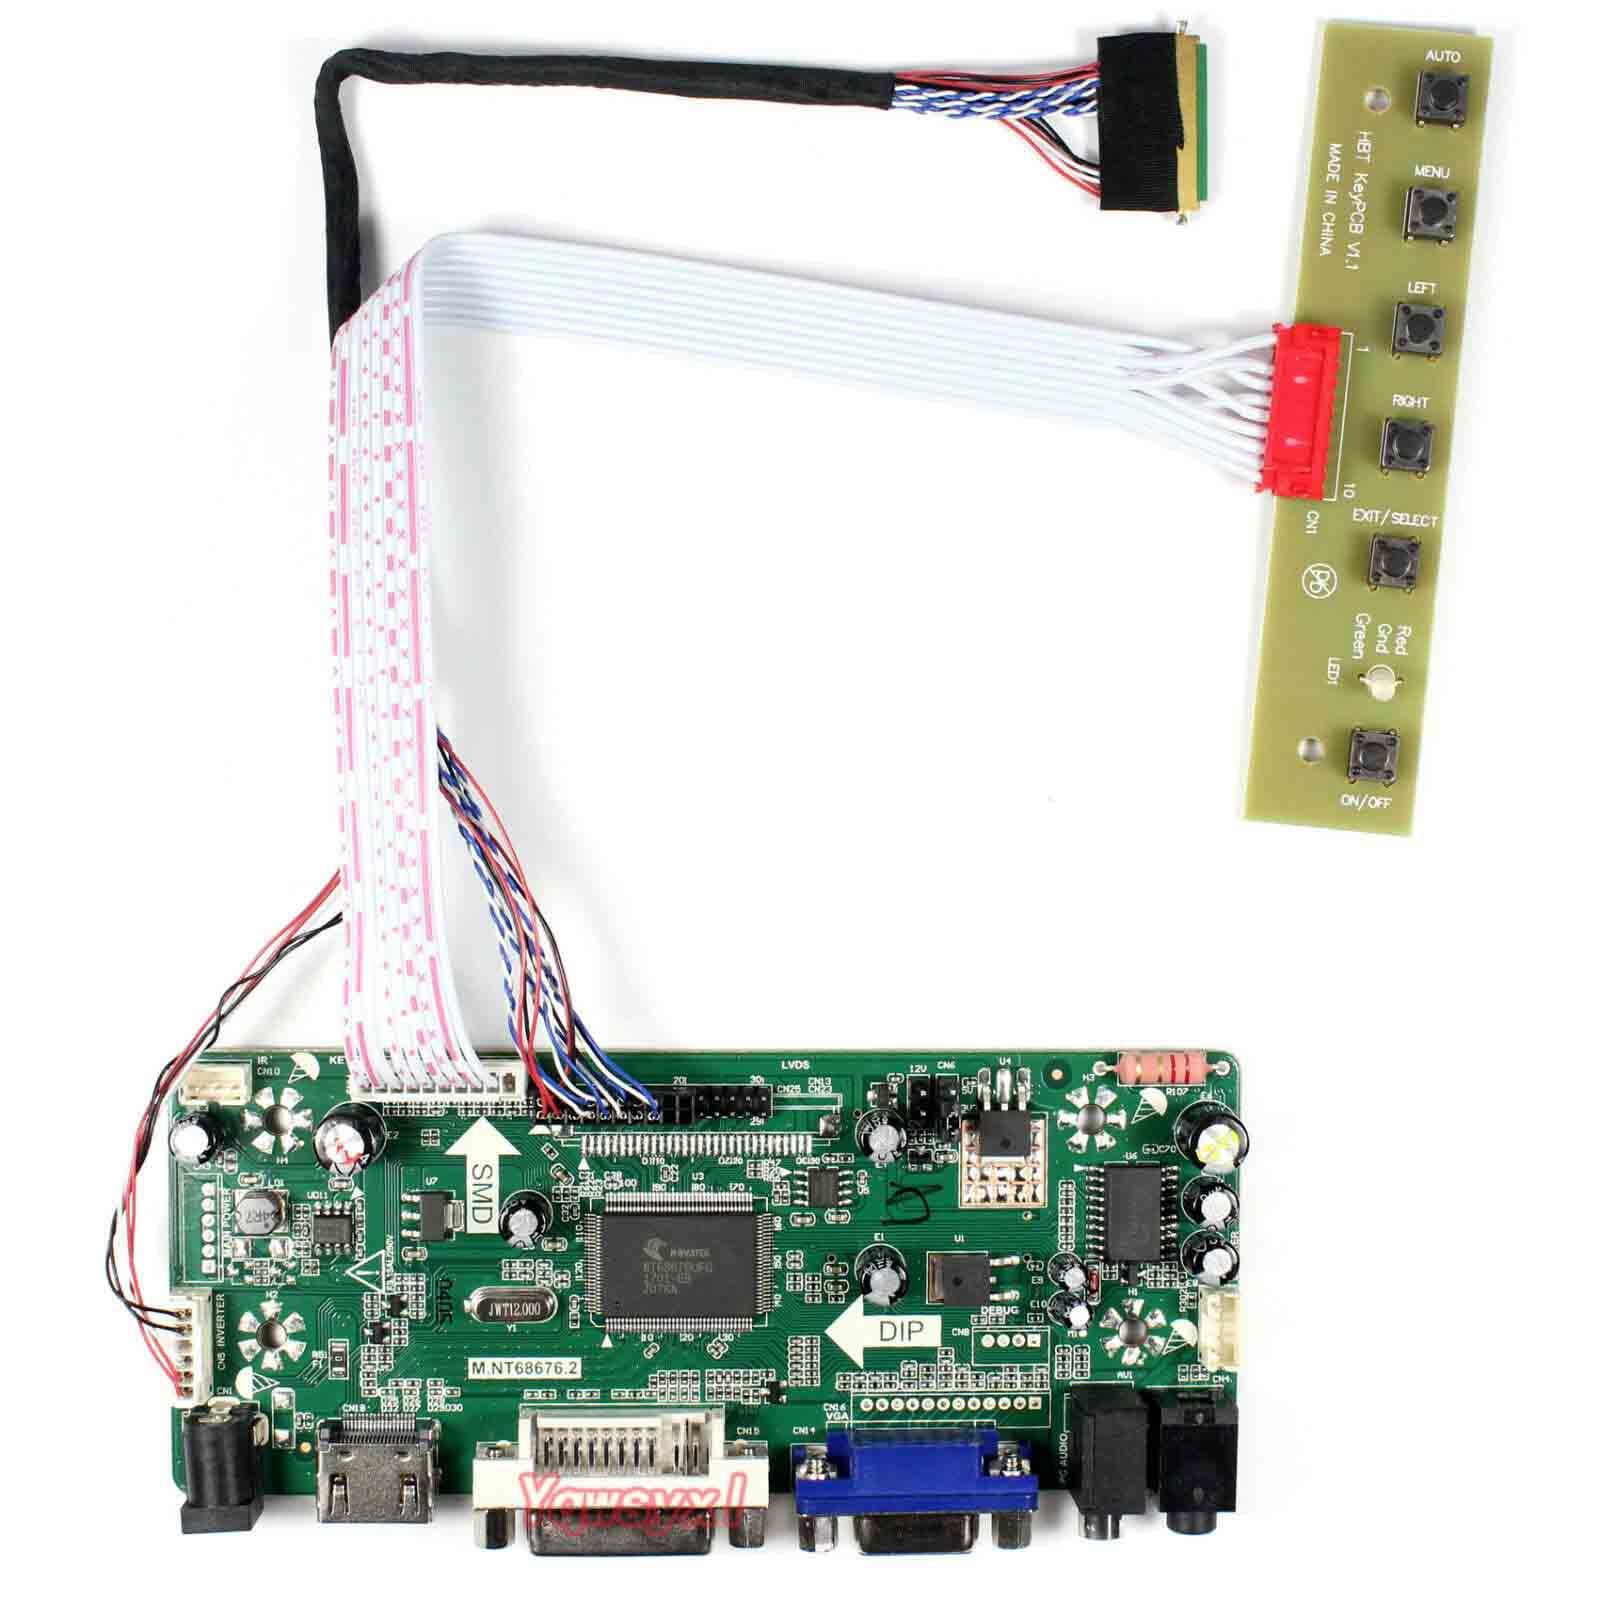 Yqwsyxl Control Board Kit For LTN140AT26-T01 LTN140AT26-L01 LTN140AT26 HDMI+DVI+VGA LCD LED Screen Controller Board Driver